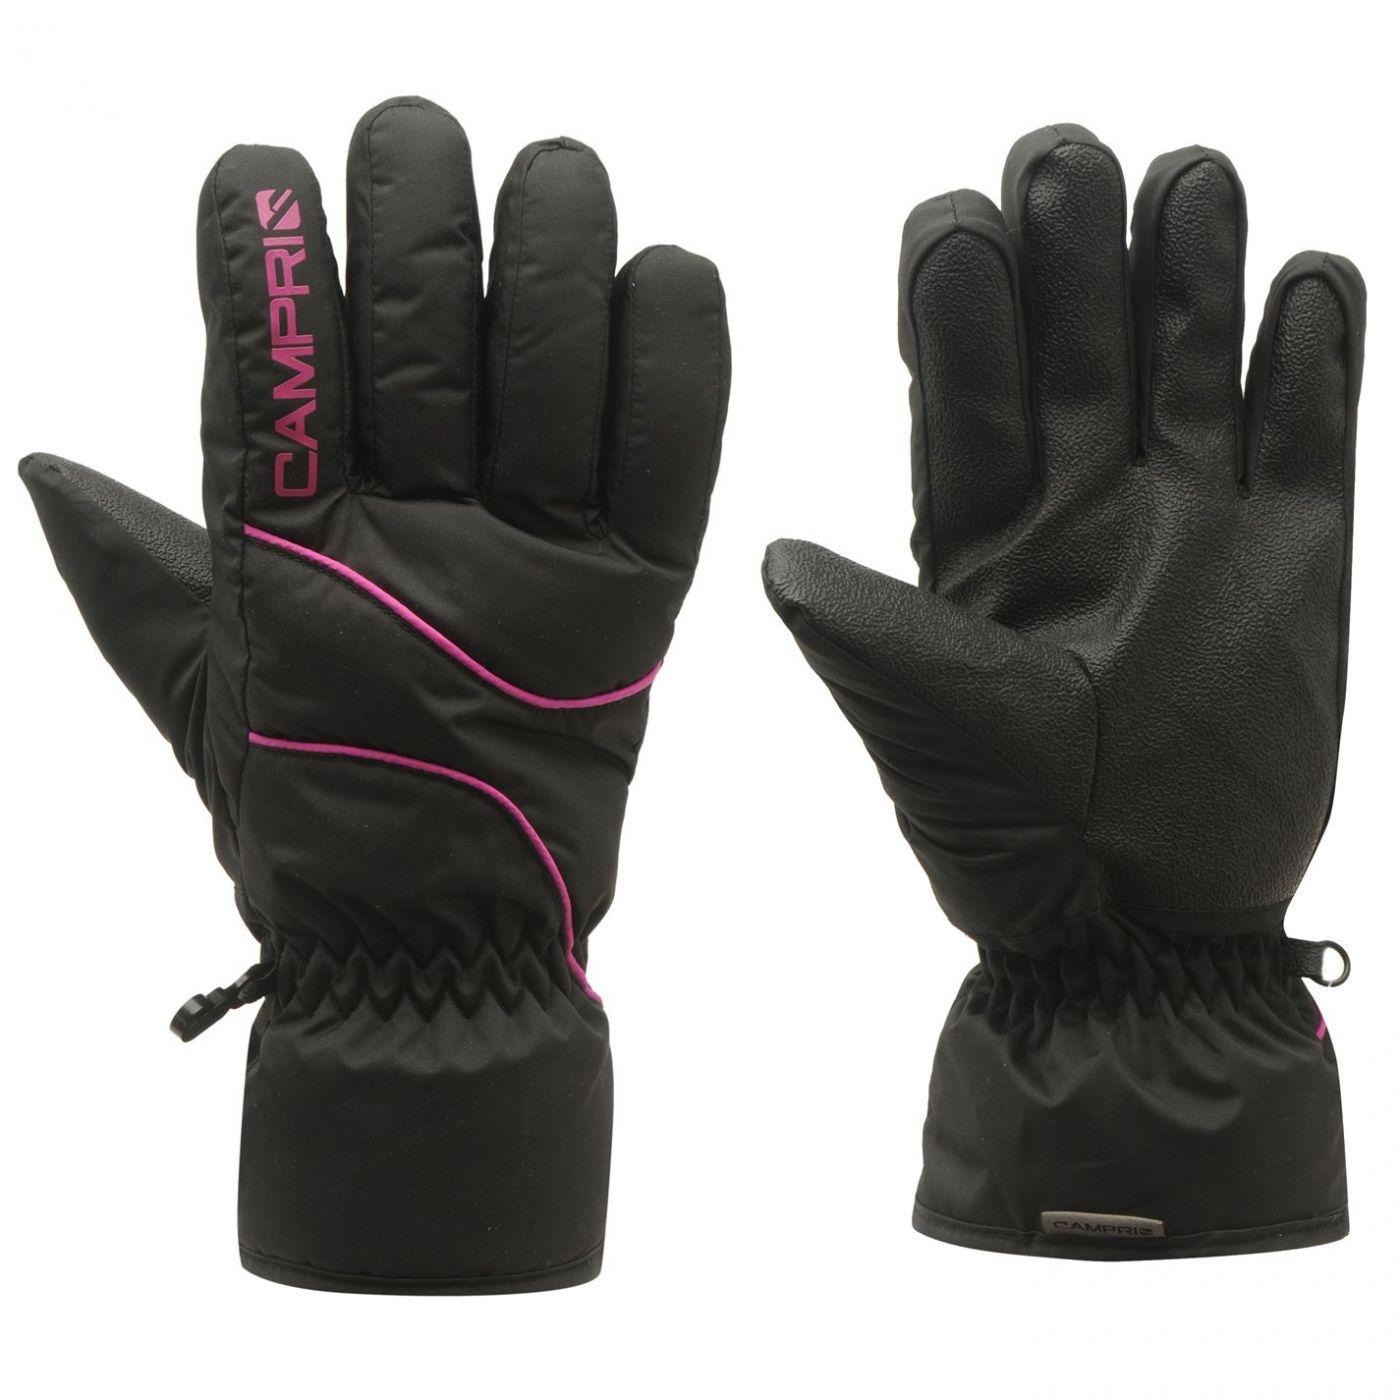 Campri Ski Glove Ld71